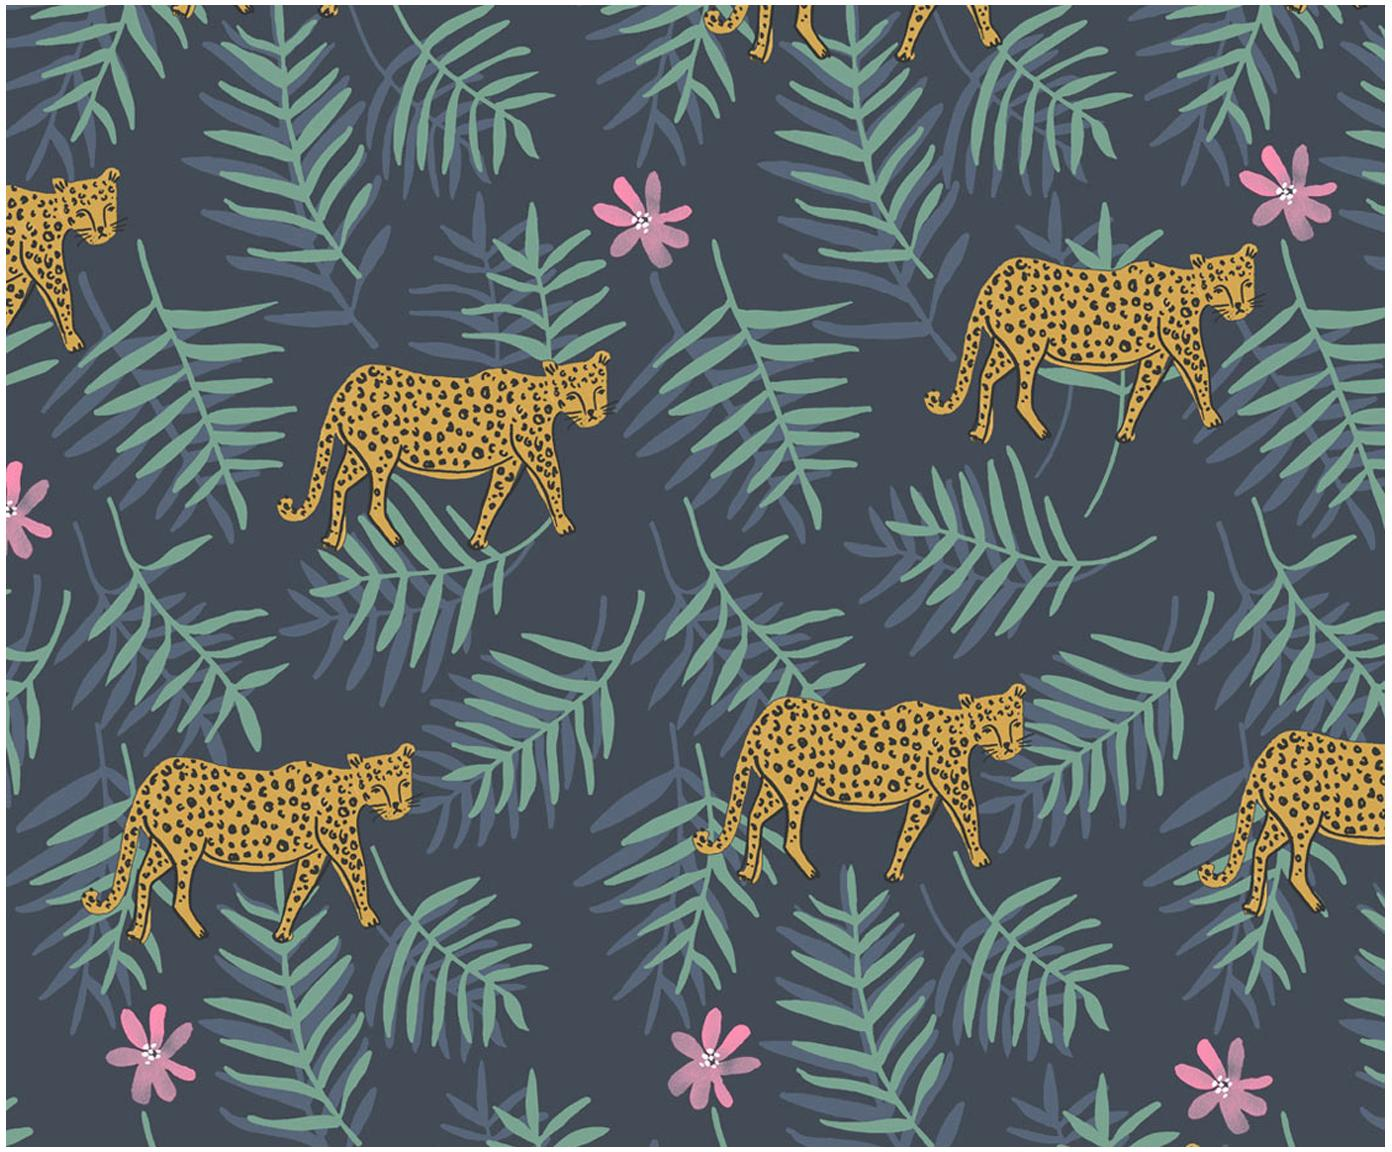 Tapete Leopard, Vlies, glatt, Dunkelblau, 52 x 1000 cm